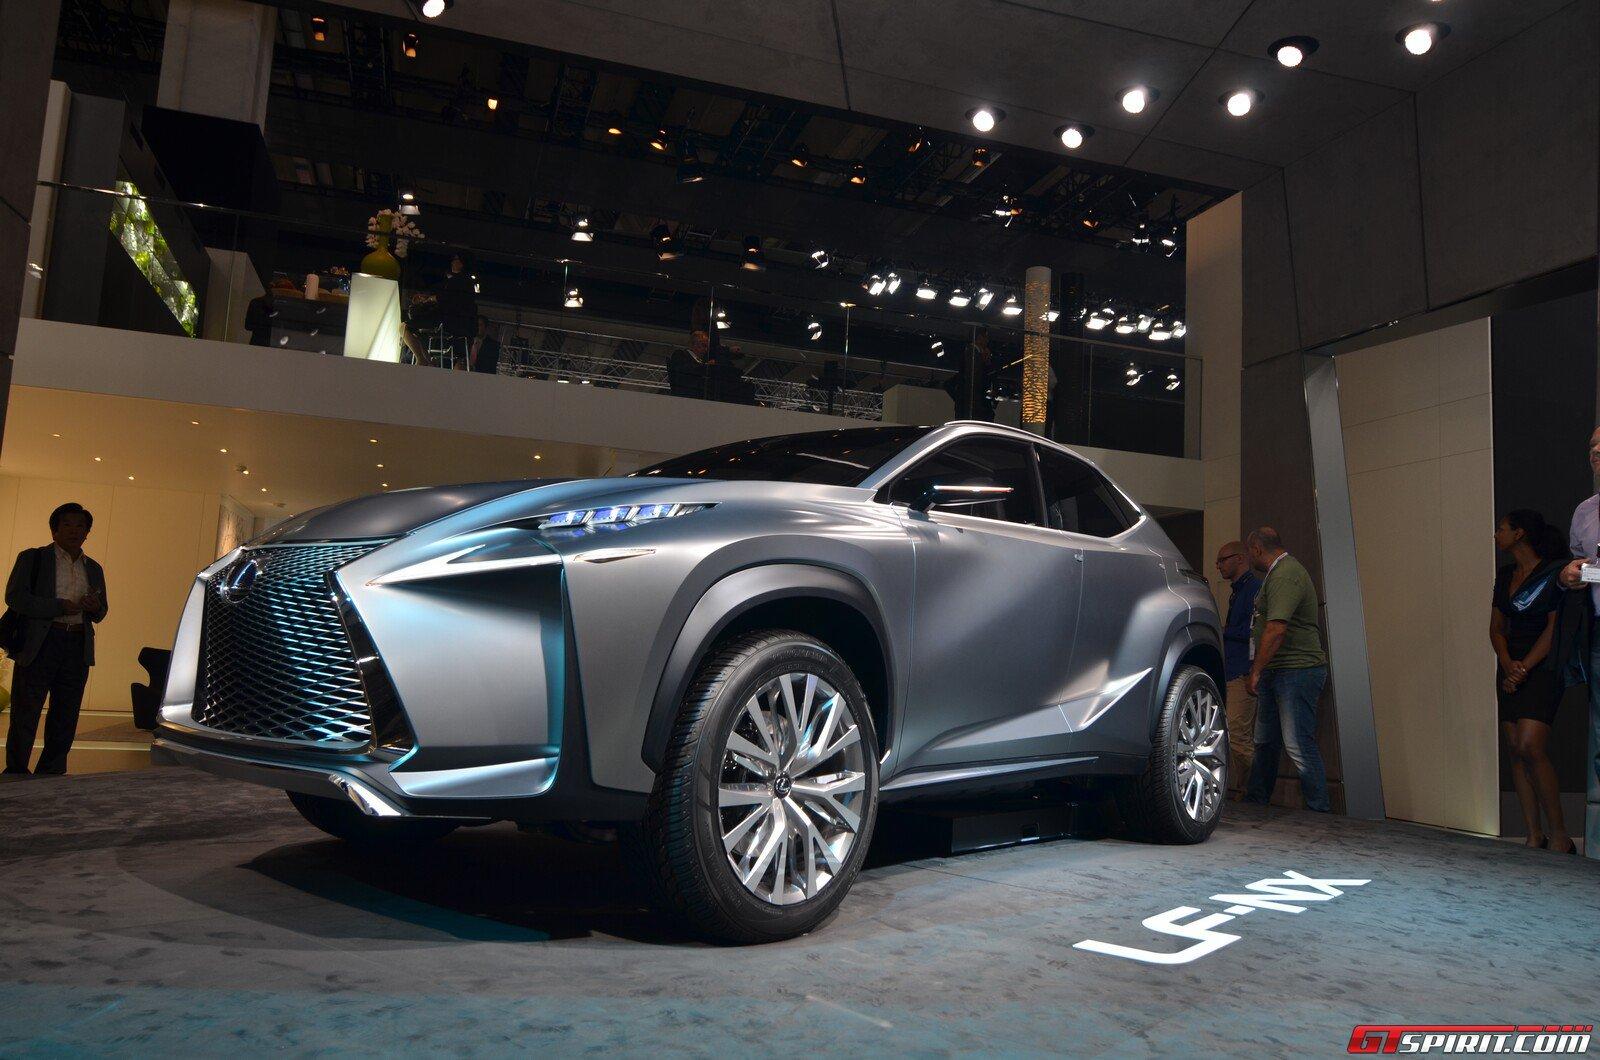 https://storage.googleapis.com/gtspirit/uploads/2013/09/Lexus-LF-NX-Crossover-Concept.jpg